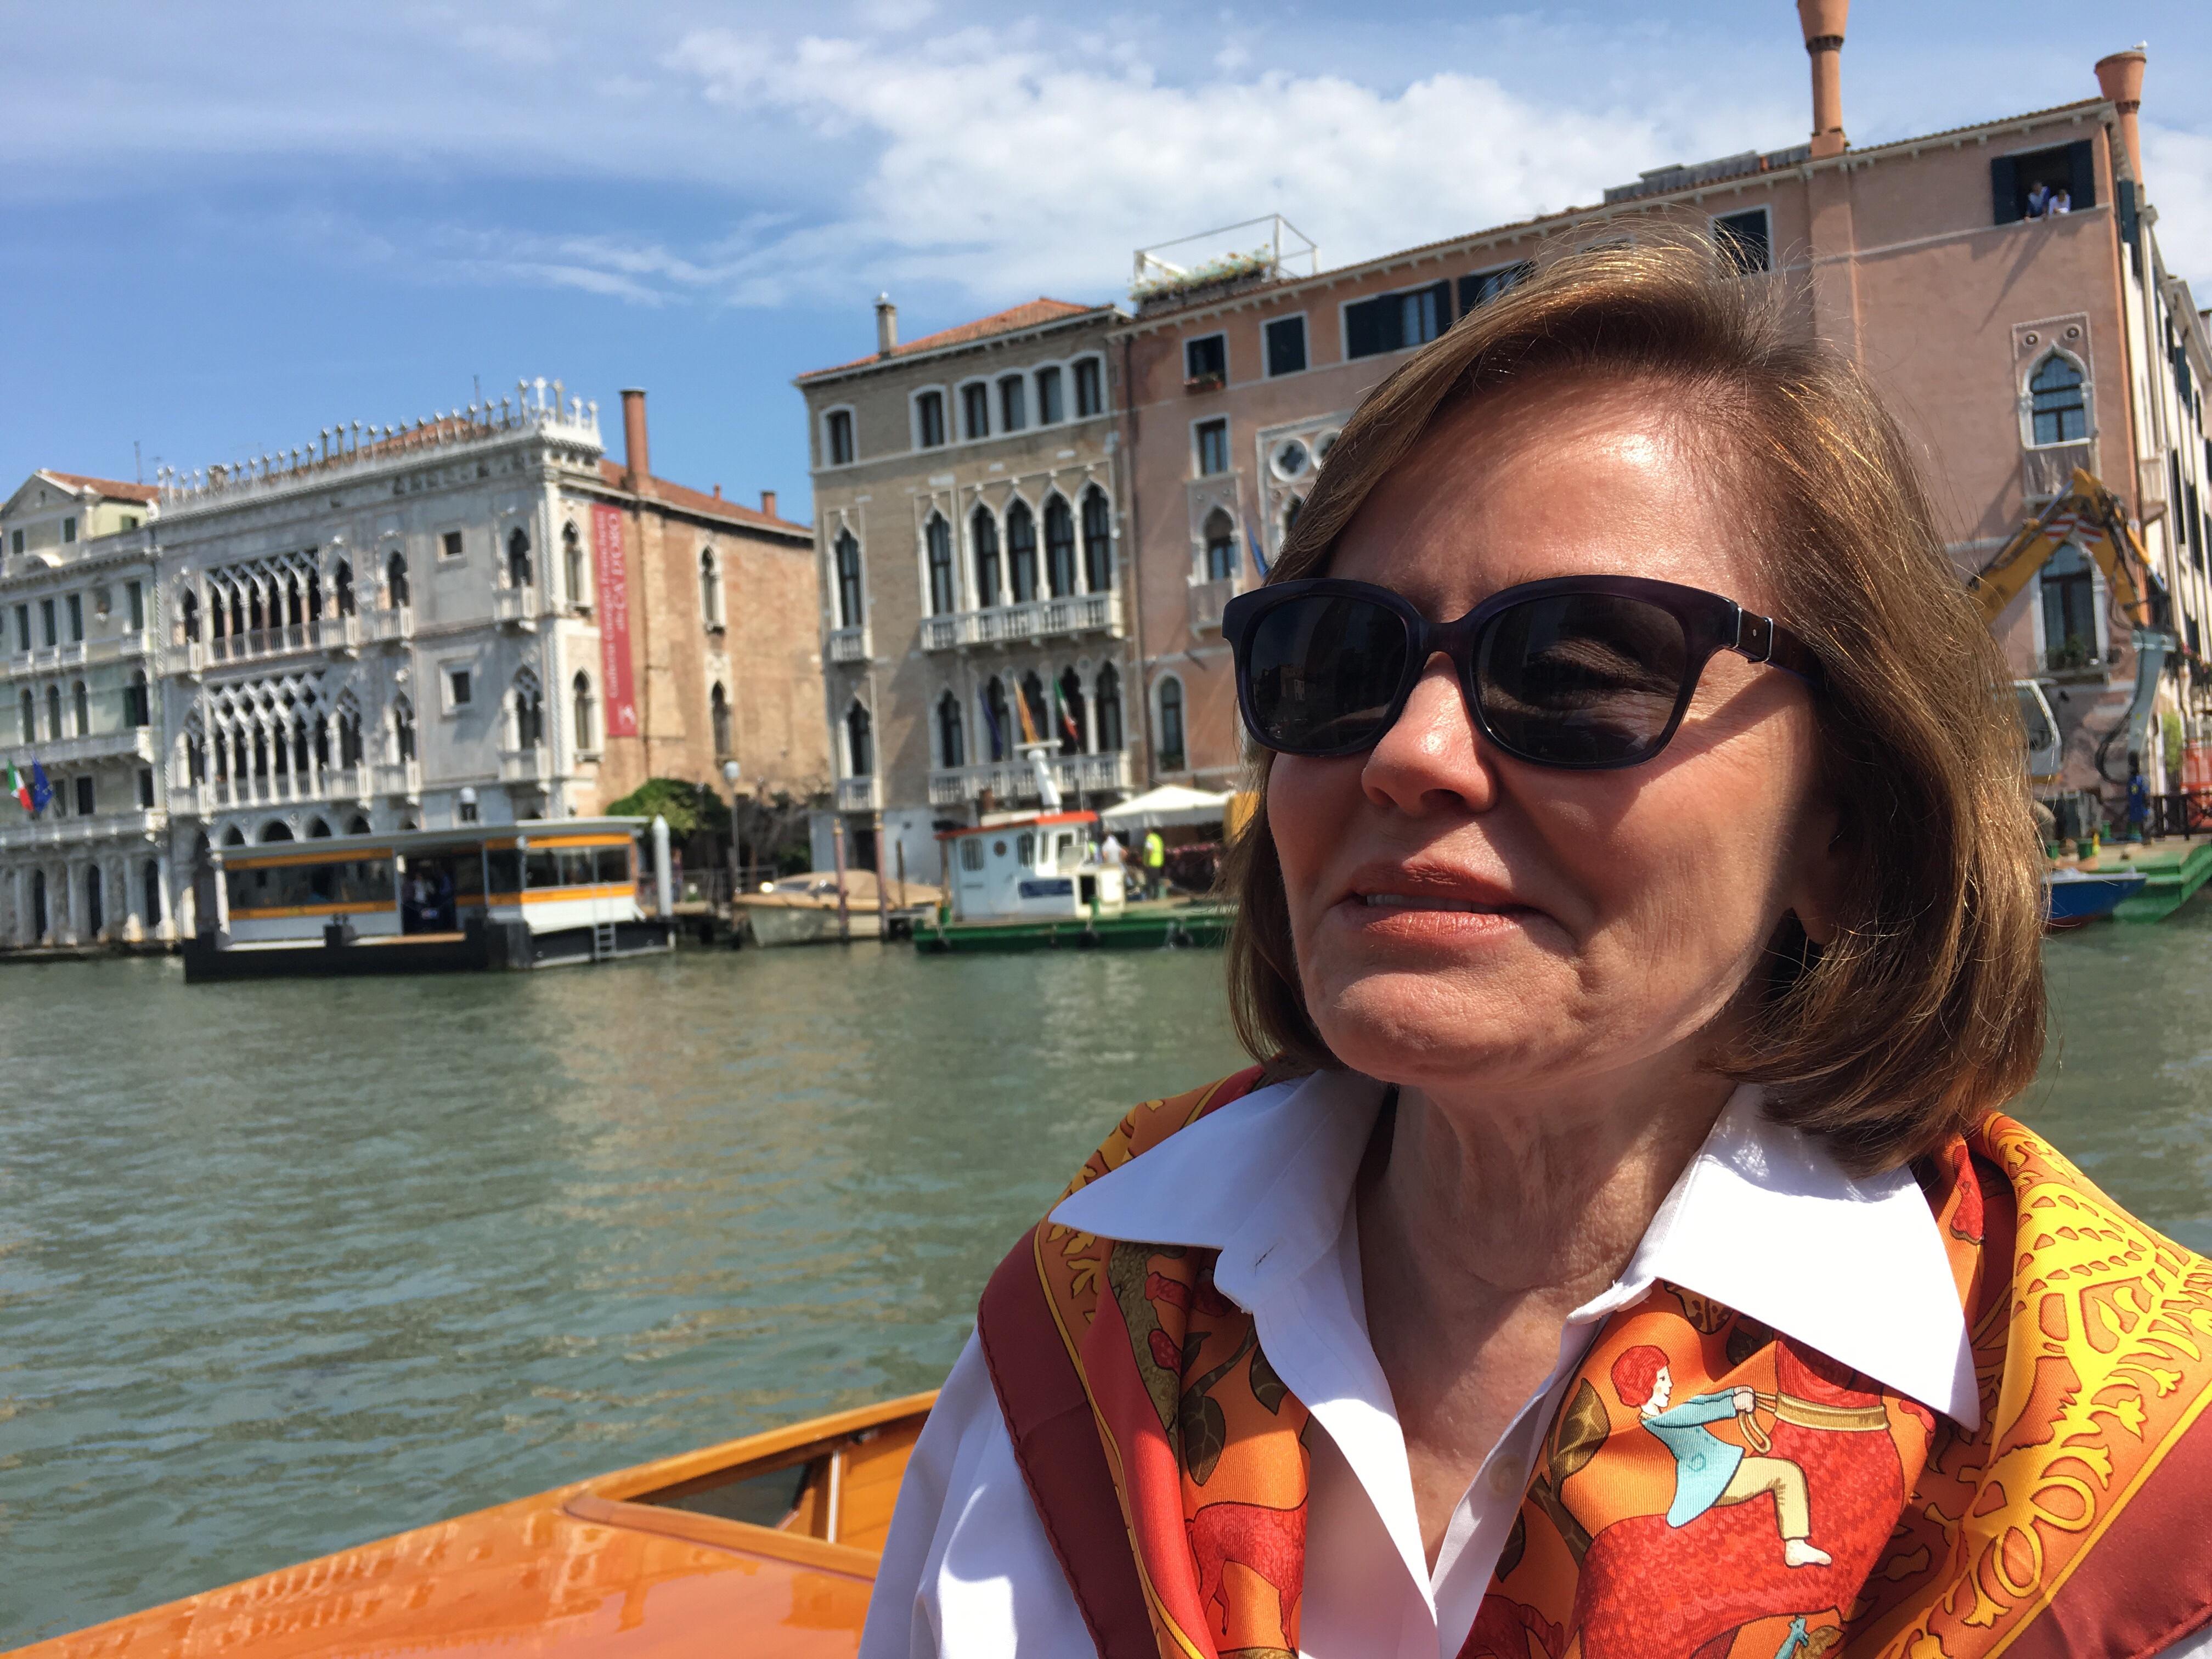 Trudy Dujardin, Grand Canal, Venice - enjoying www.grand-tourist.com experience